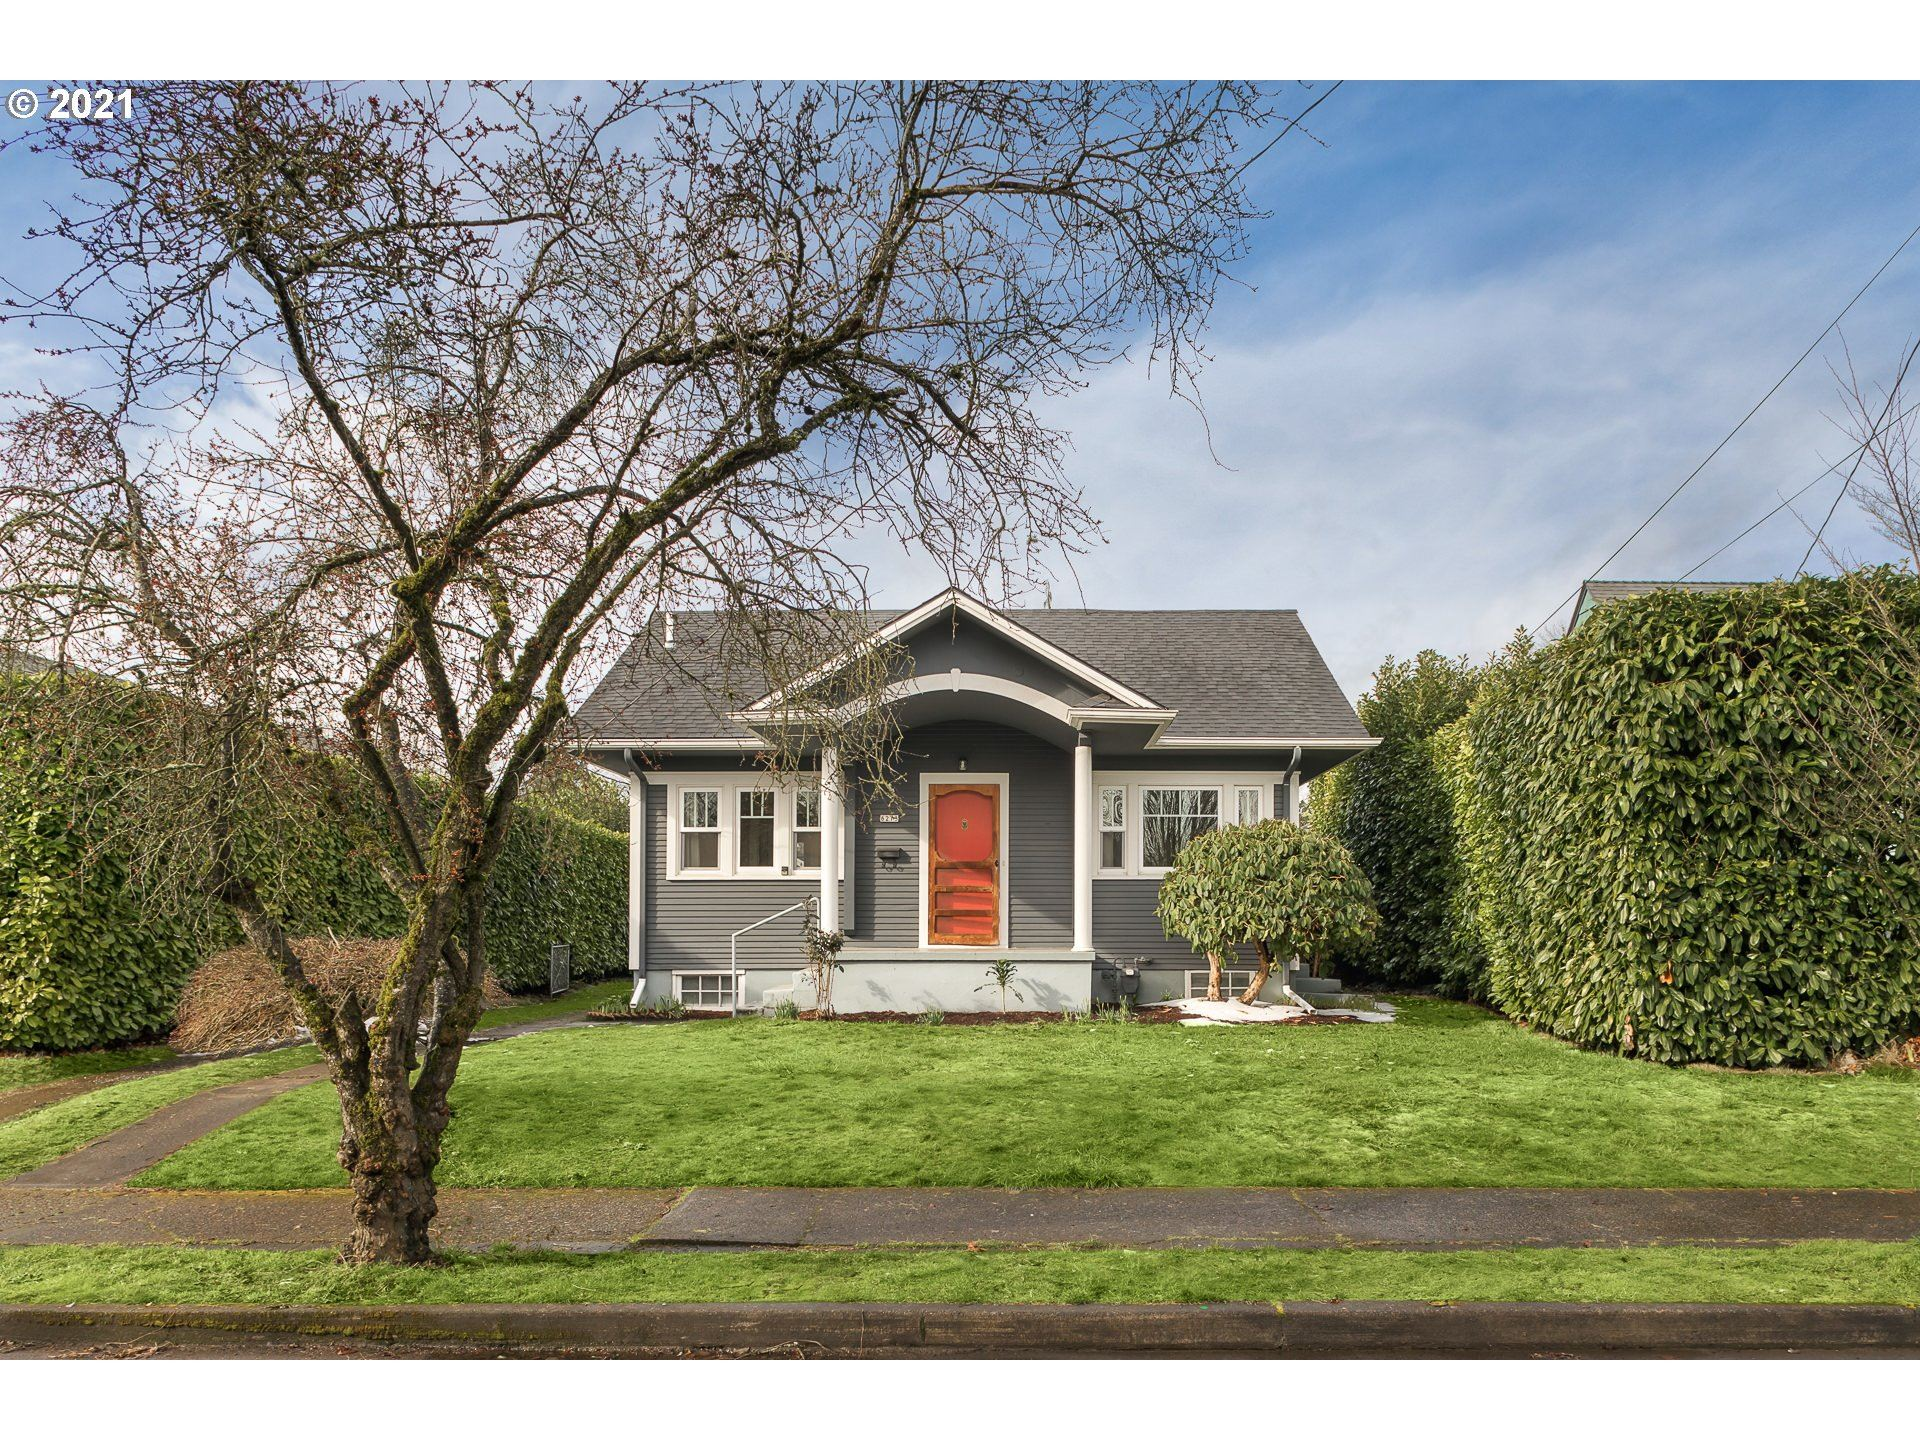 6213 SE 21ST AVE, Portland, OR 97202 - MLS#: 21165072